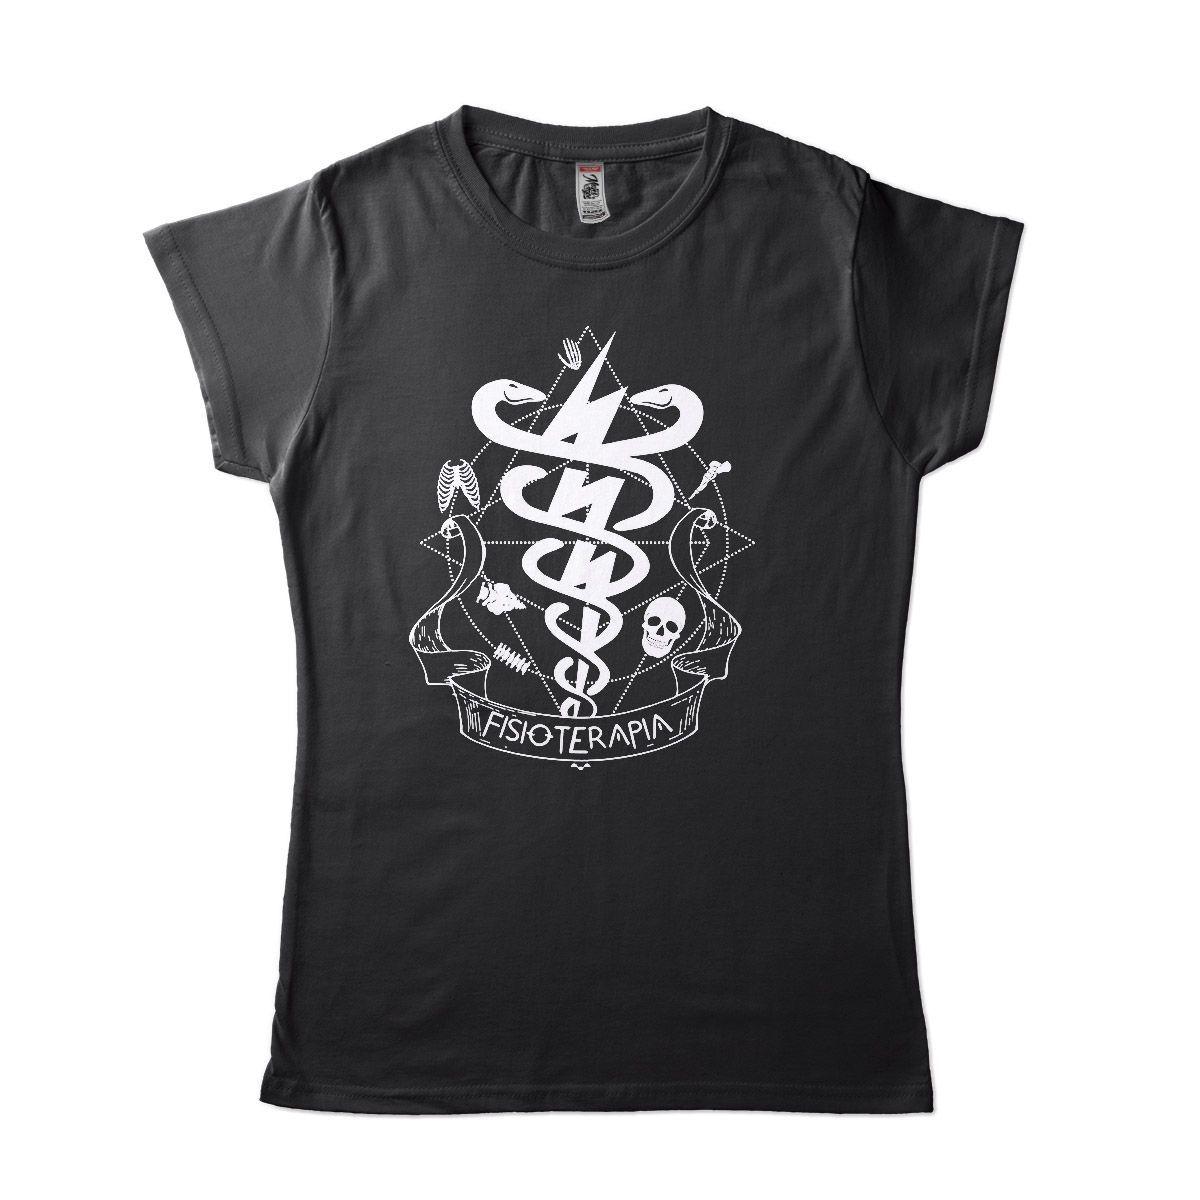 camiseta de fisioterapia criativa feminina e masculina